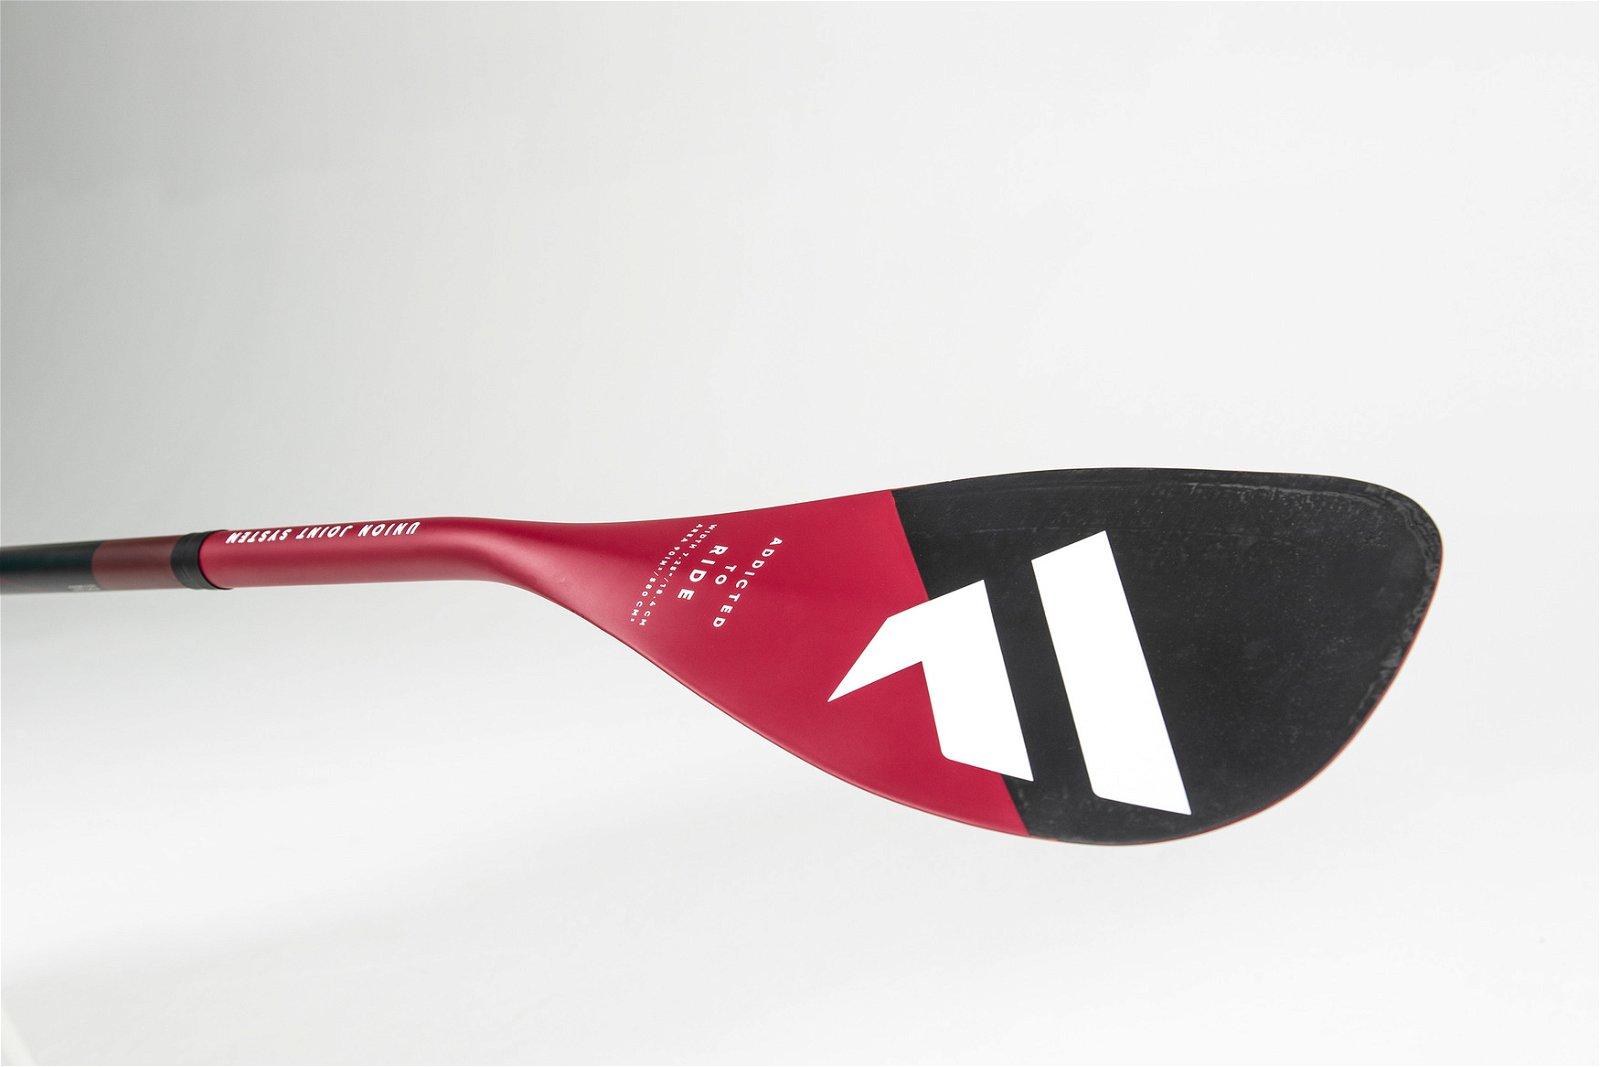 Carbon 80 Adjustable 3-Piece